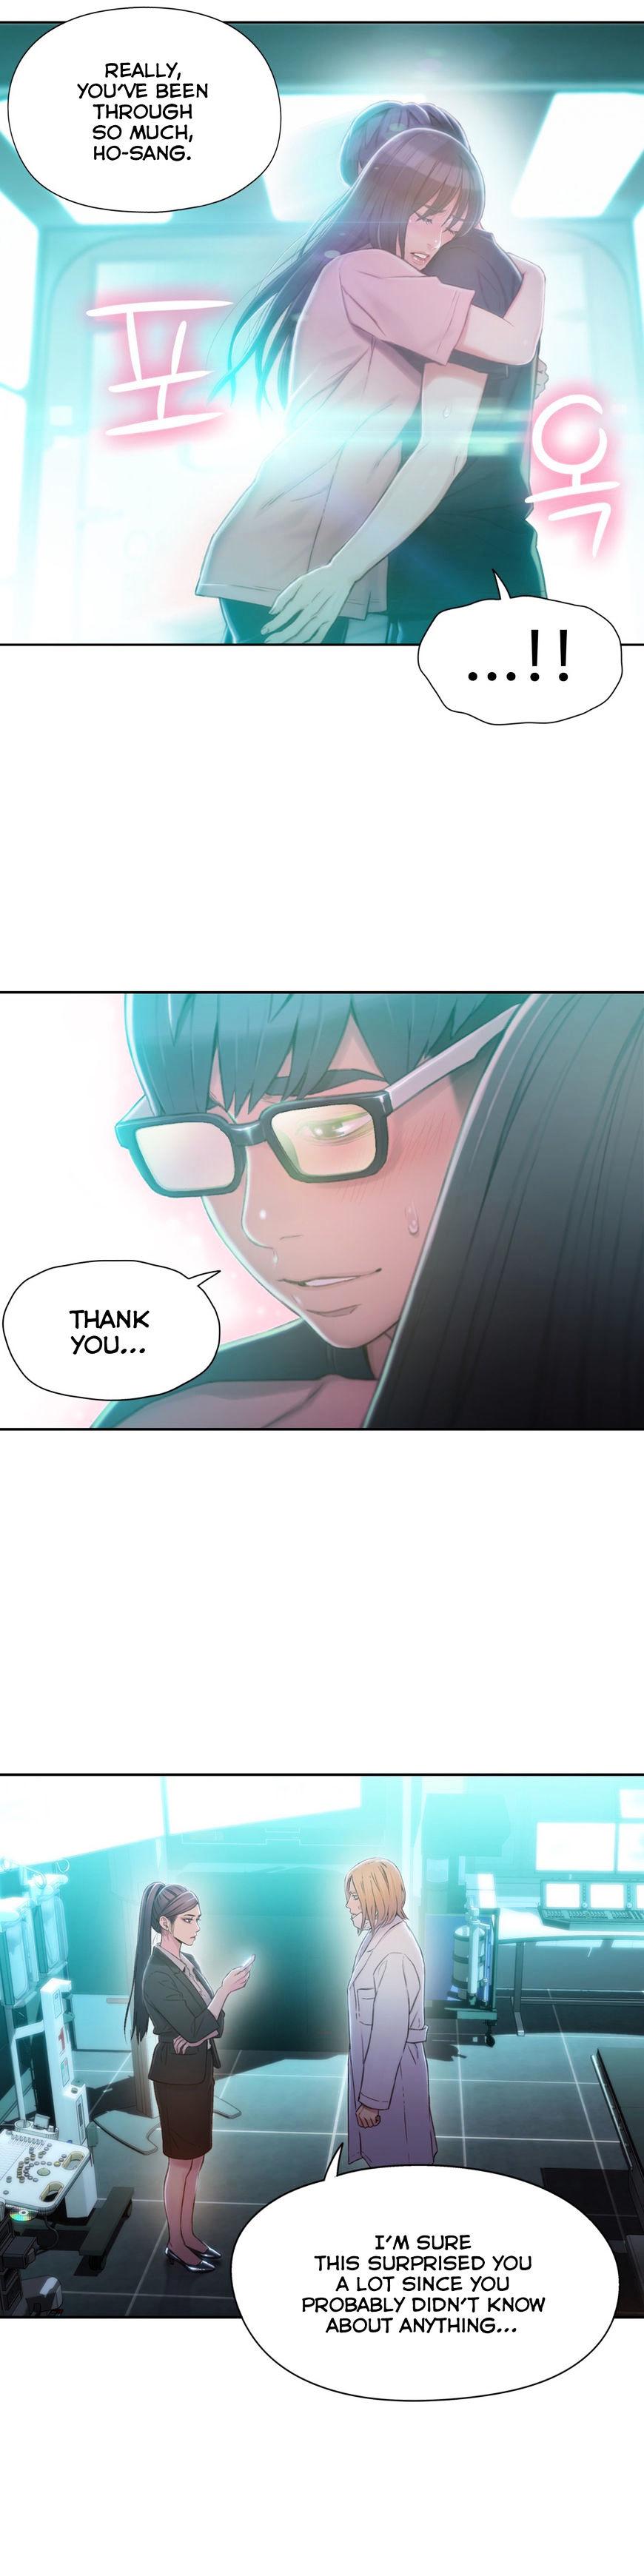 Sweet Guy Chapter 73 Full Manga Read Scan Image 7